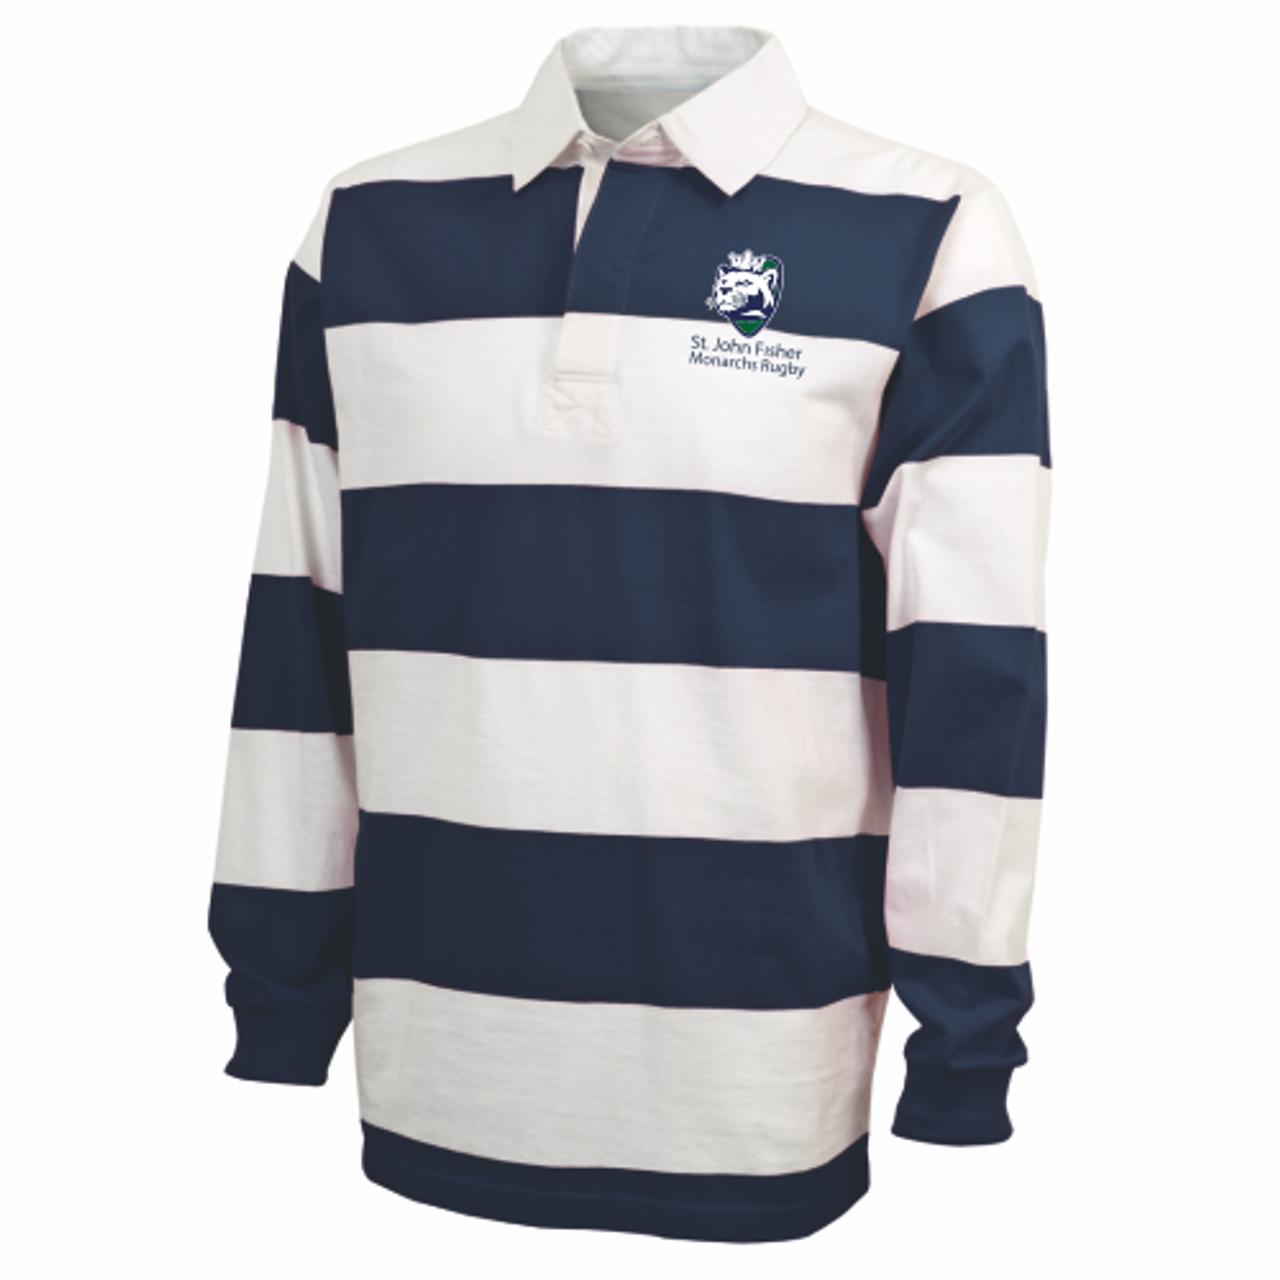 Fisher WRFC Rugby-Stripe Polo